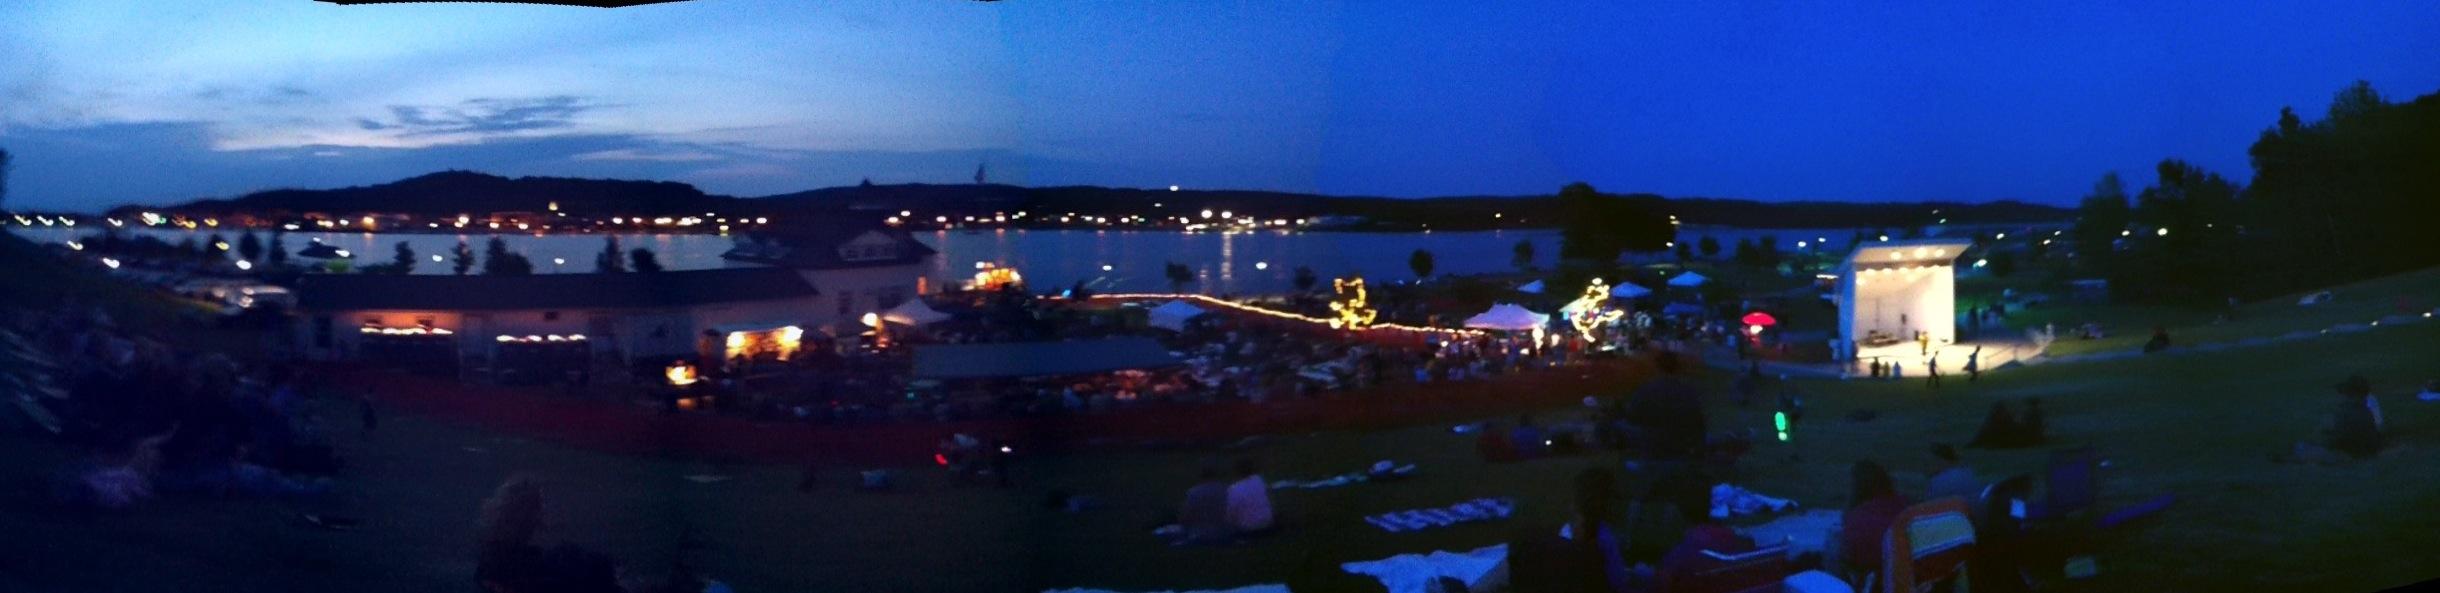 2011-Solstice-Festival-Panorama